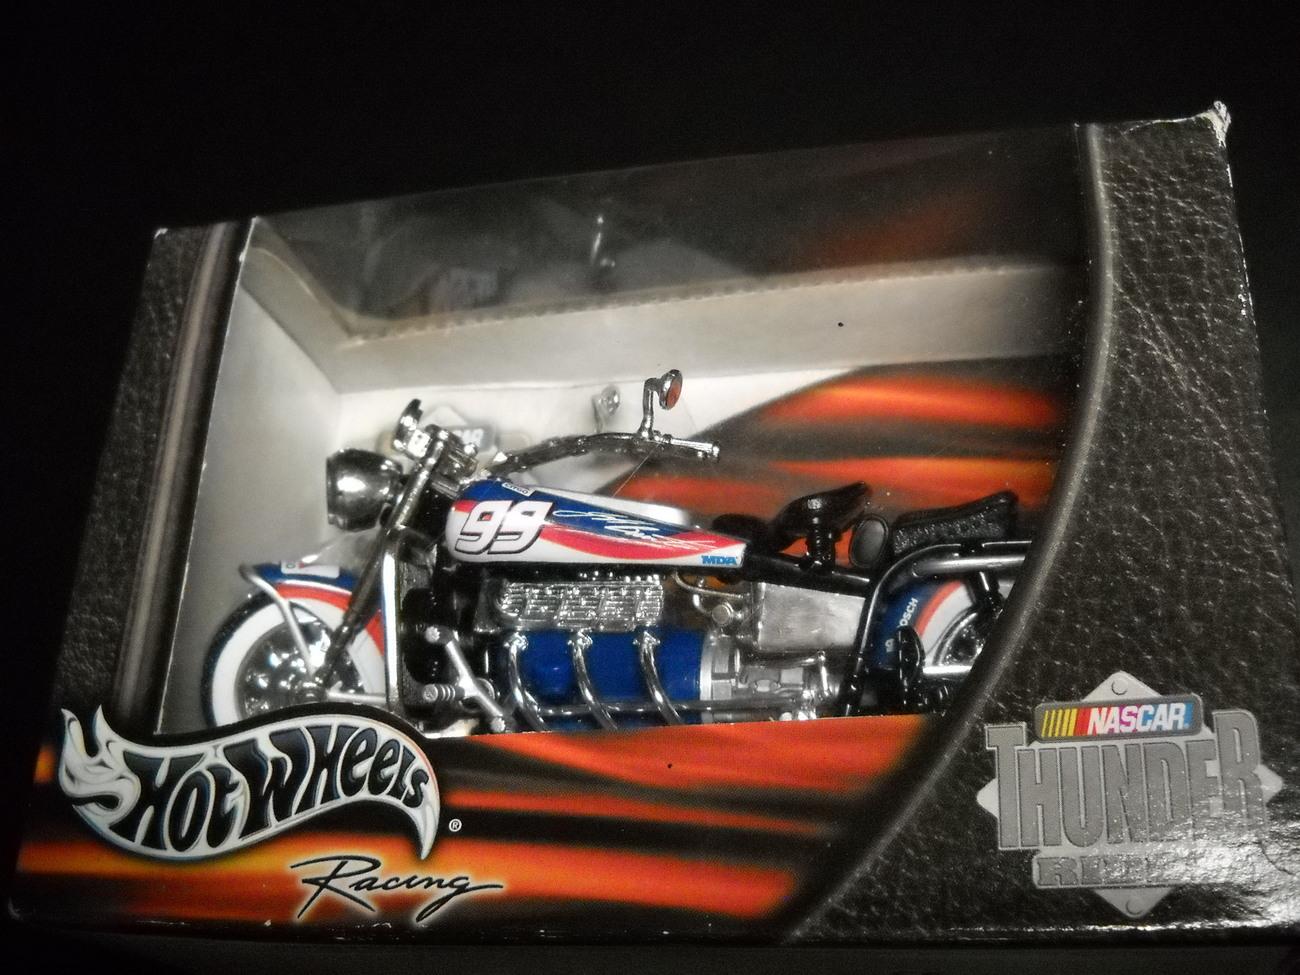 Hot Wheels Nascar Racing 2002 Thunder Rides Series Citgo 55731 Still Sealed Box